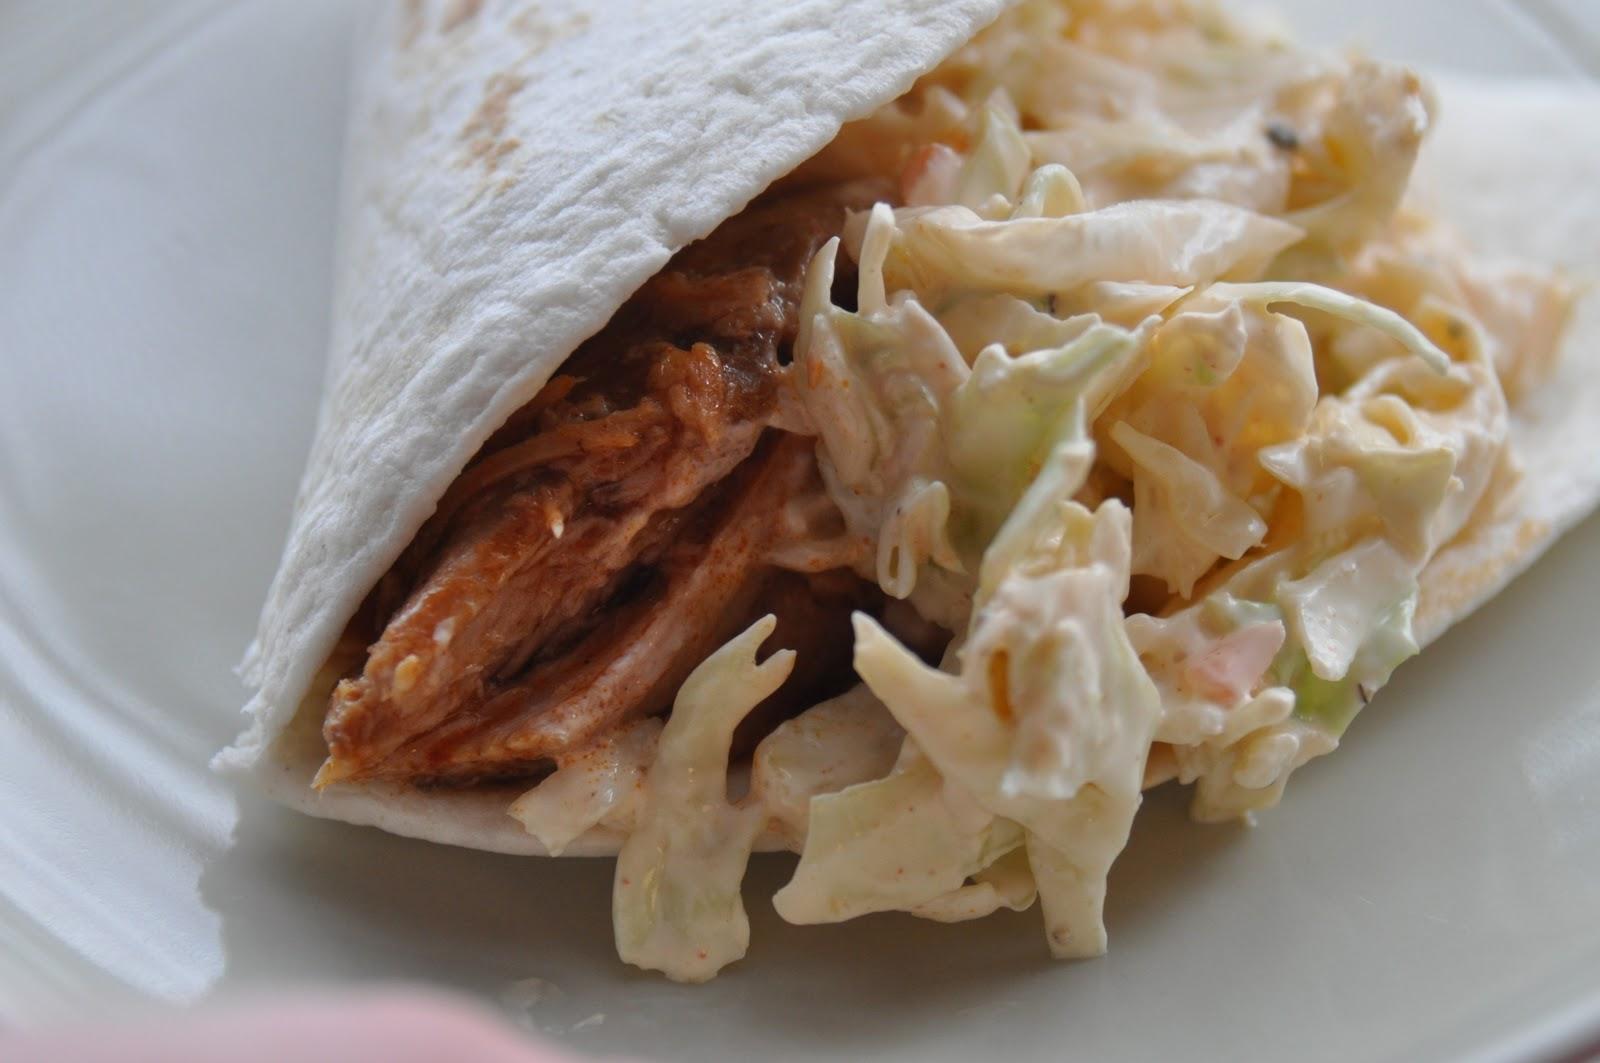 Simply Delish Bakery: Carnitas Tacos with Spicy Slaw